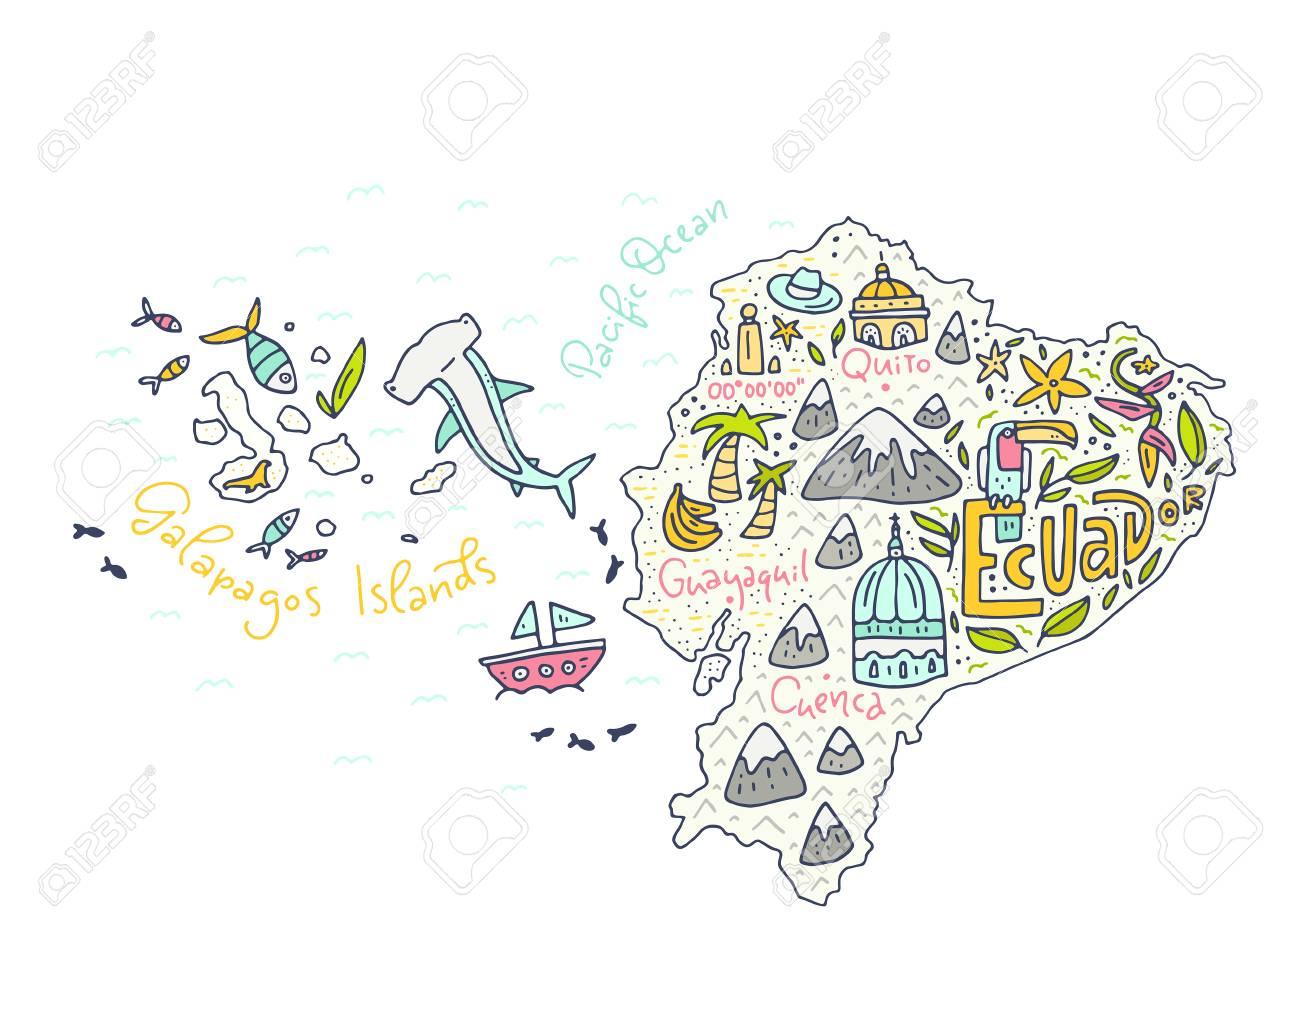 Cartoon Map Of Ecuador And Galapagos Islands Hand Drawn Illustration